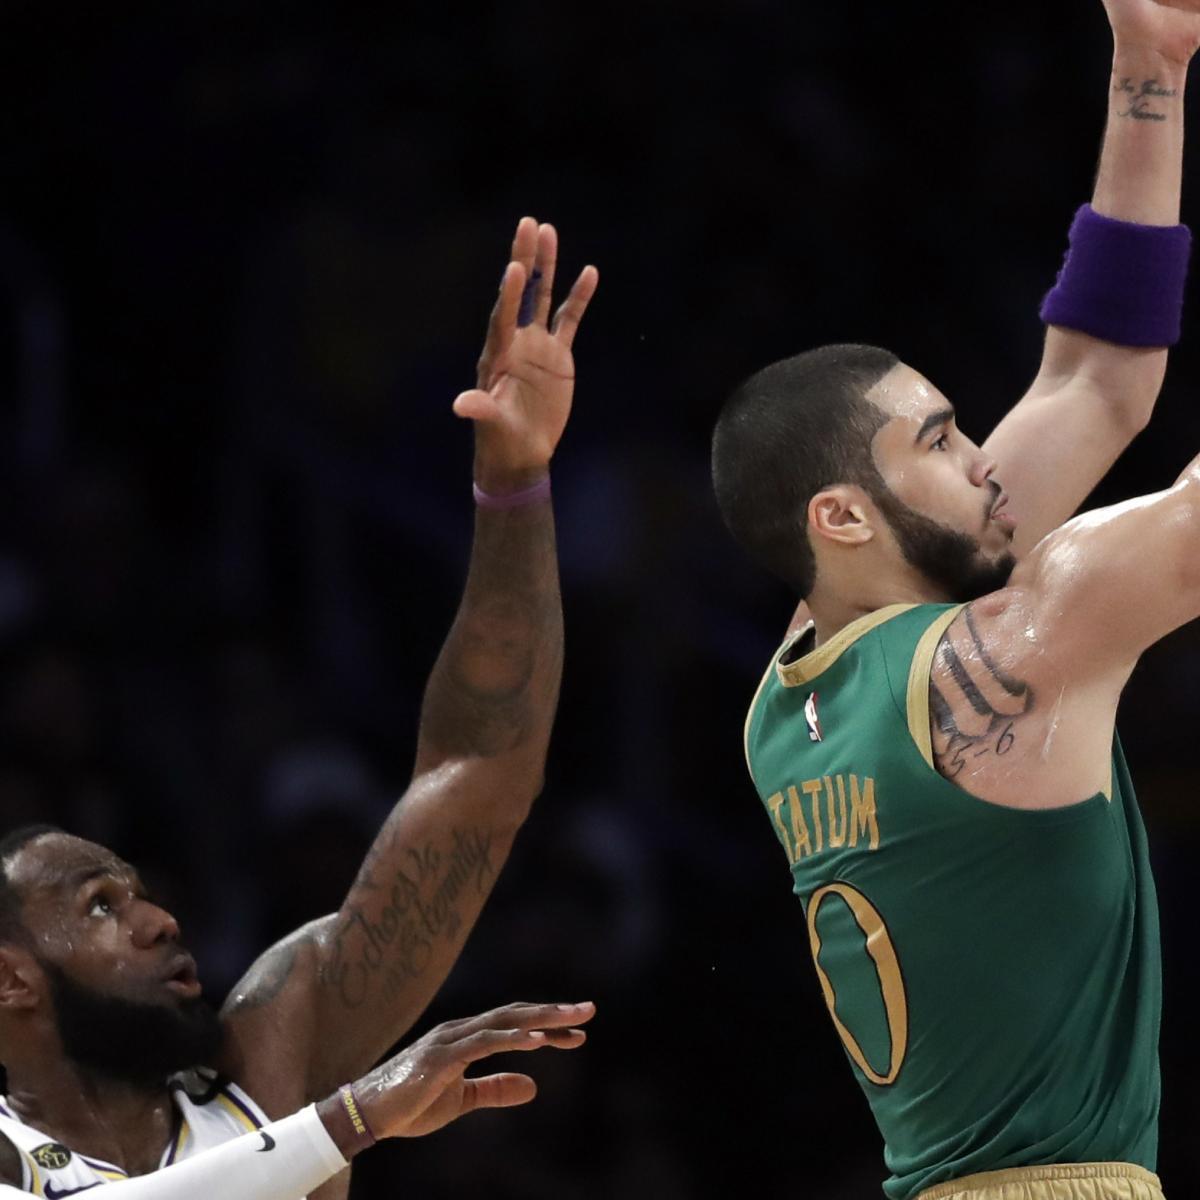 LeBron James Calls Jayson Tatum an 'Absolute Problem' After 41 Points vs. Lakers